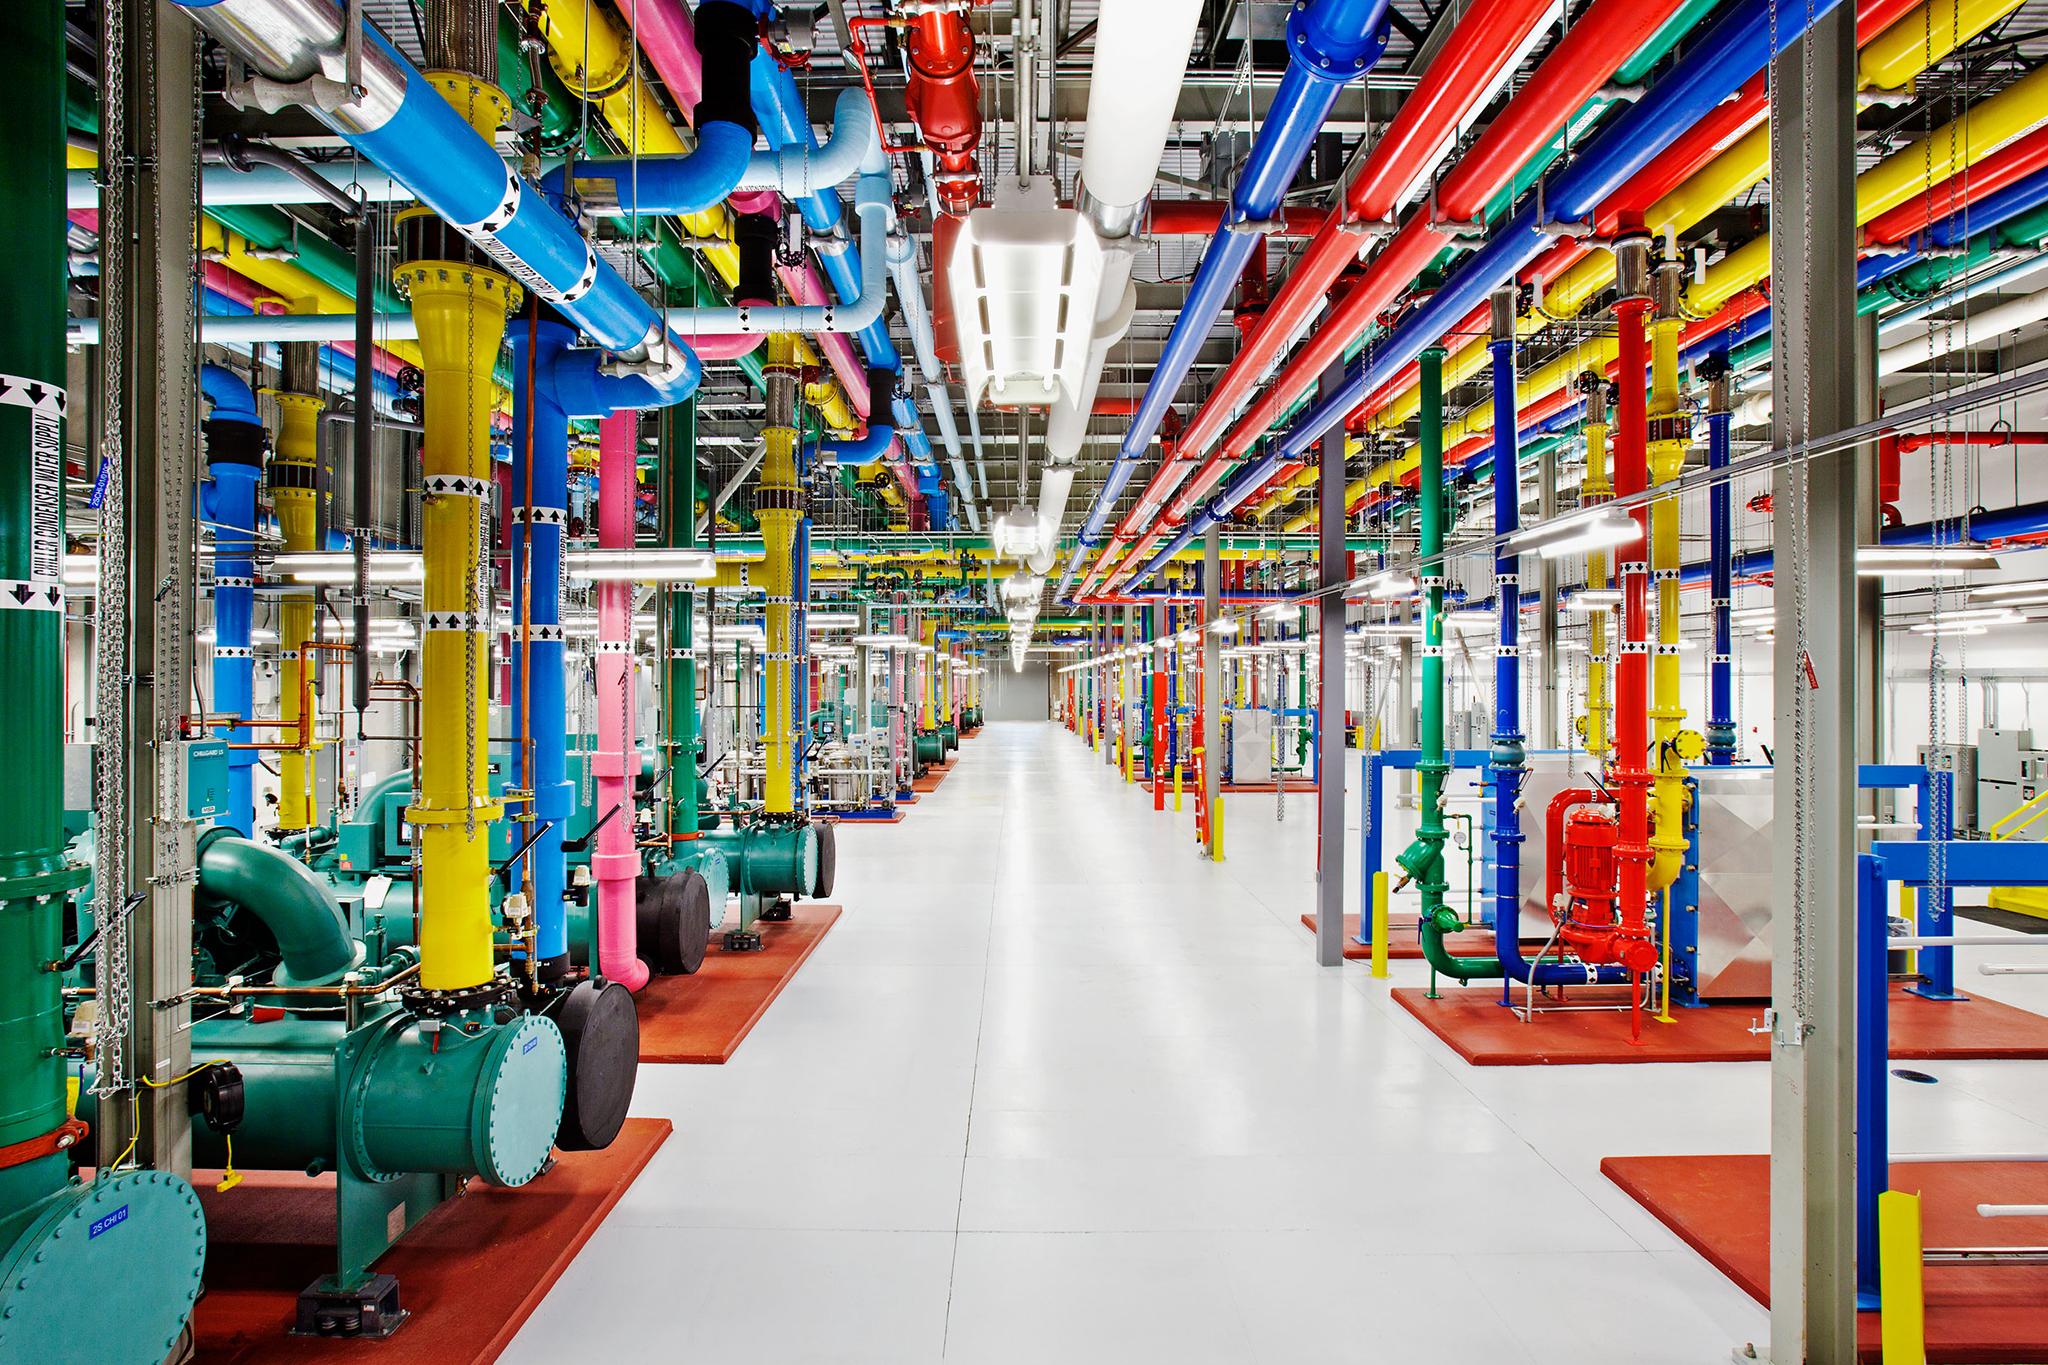 ff_googleinfrastructure_large.jpg